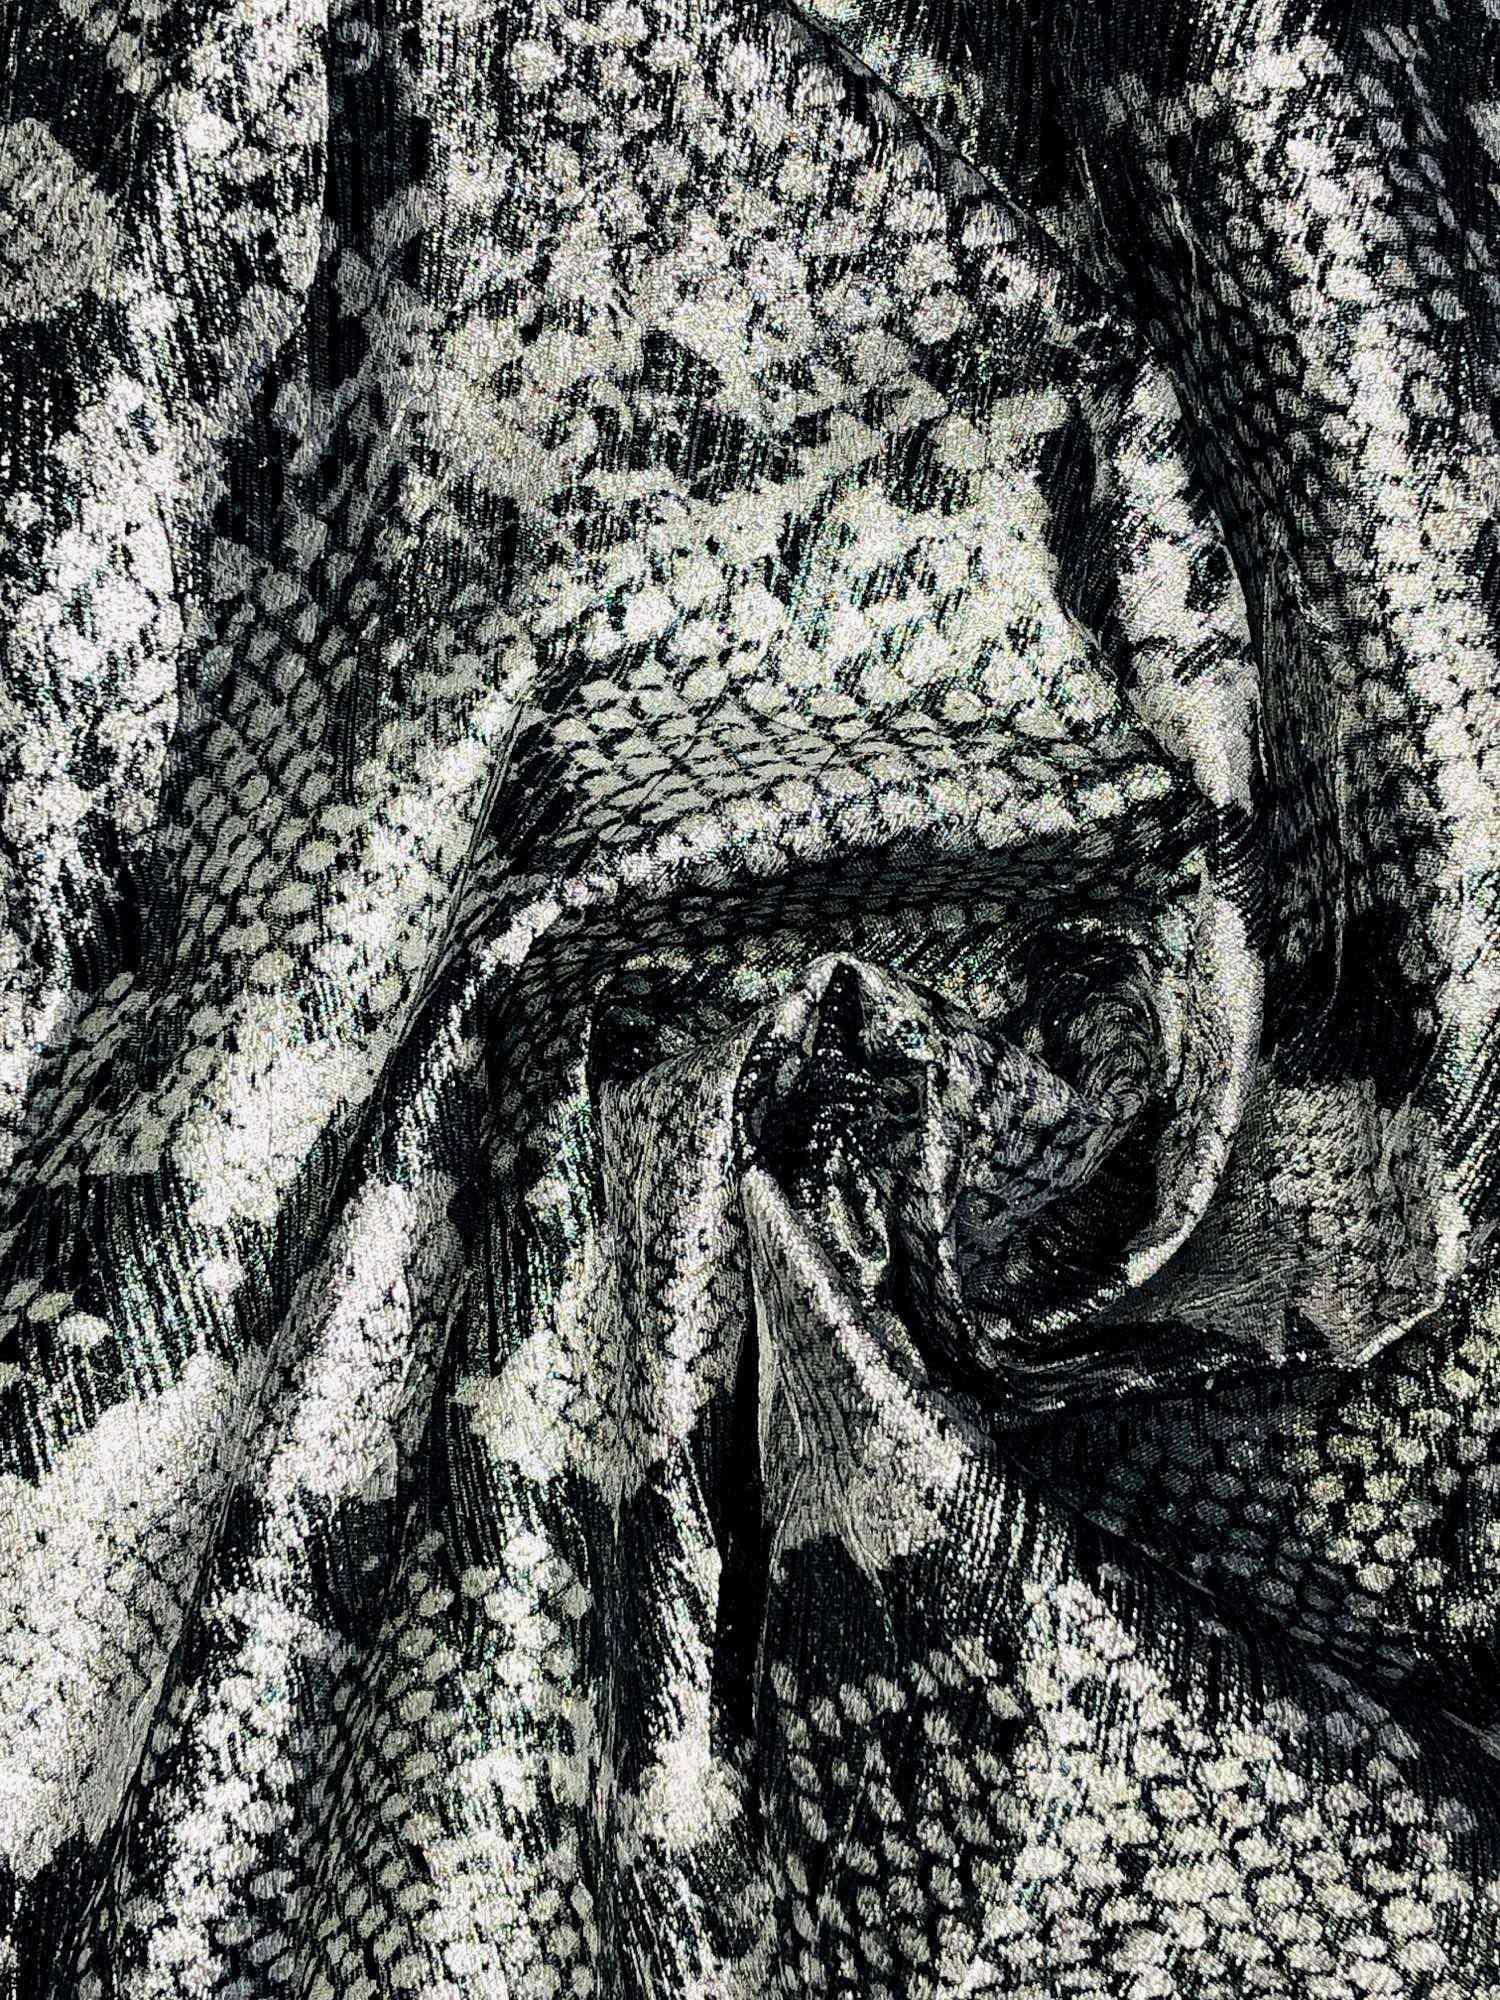 Printed Fabrics - grip 7178 - GRIP 7178 Polyester